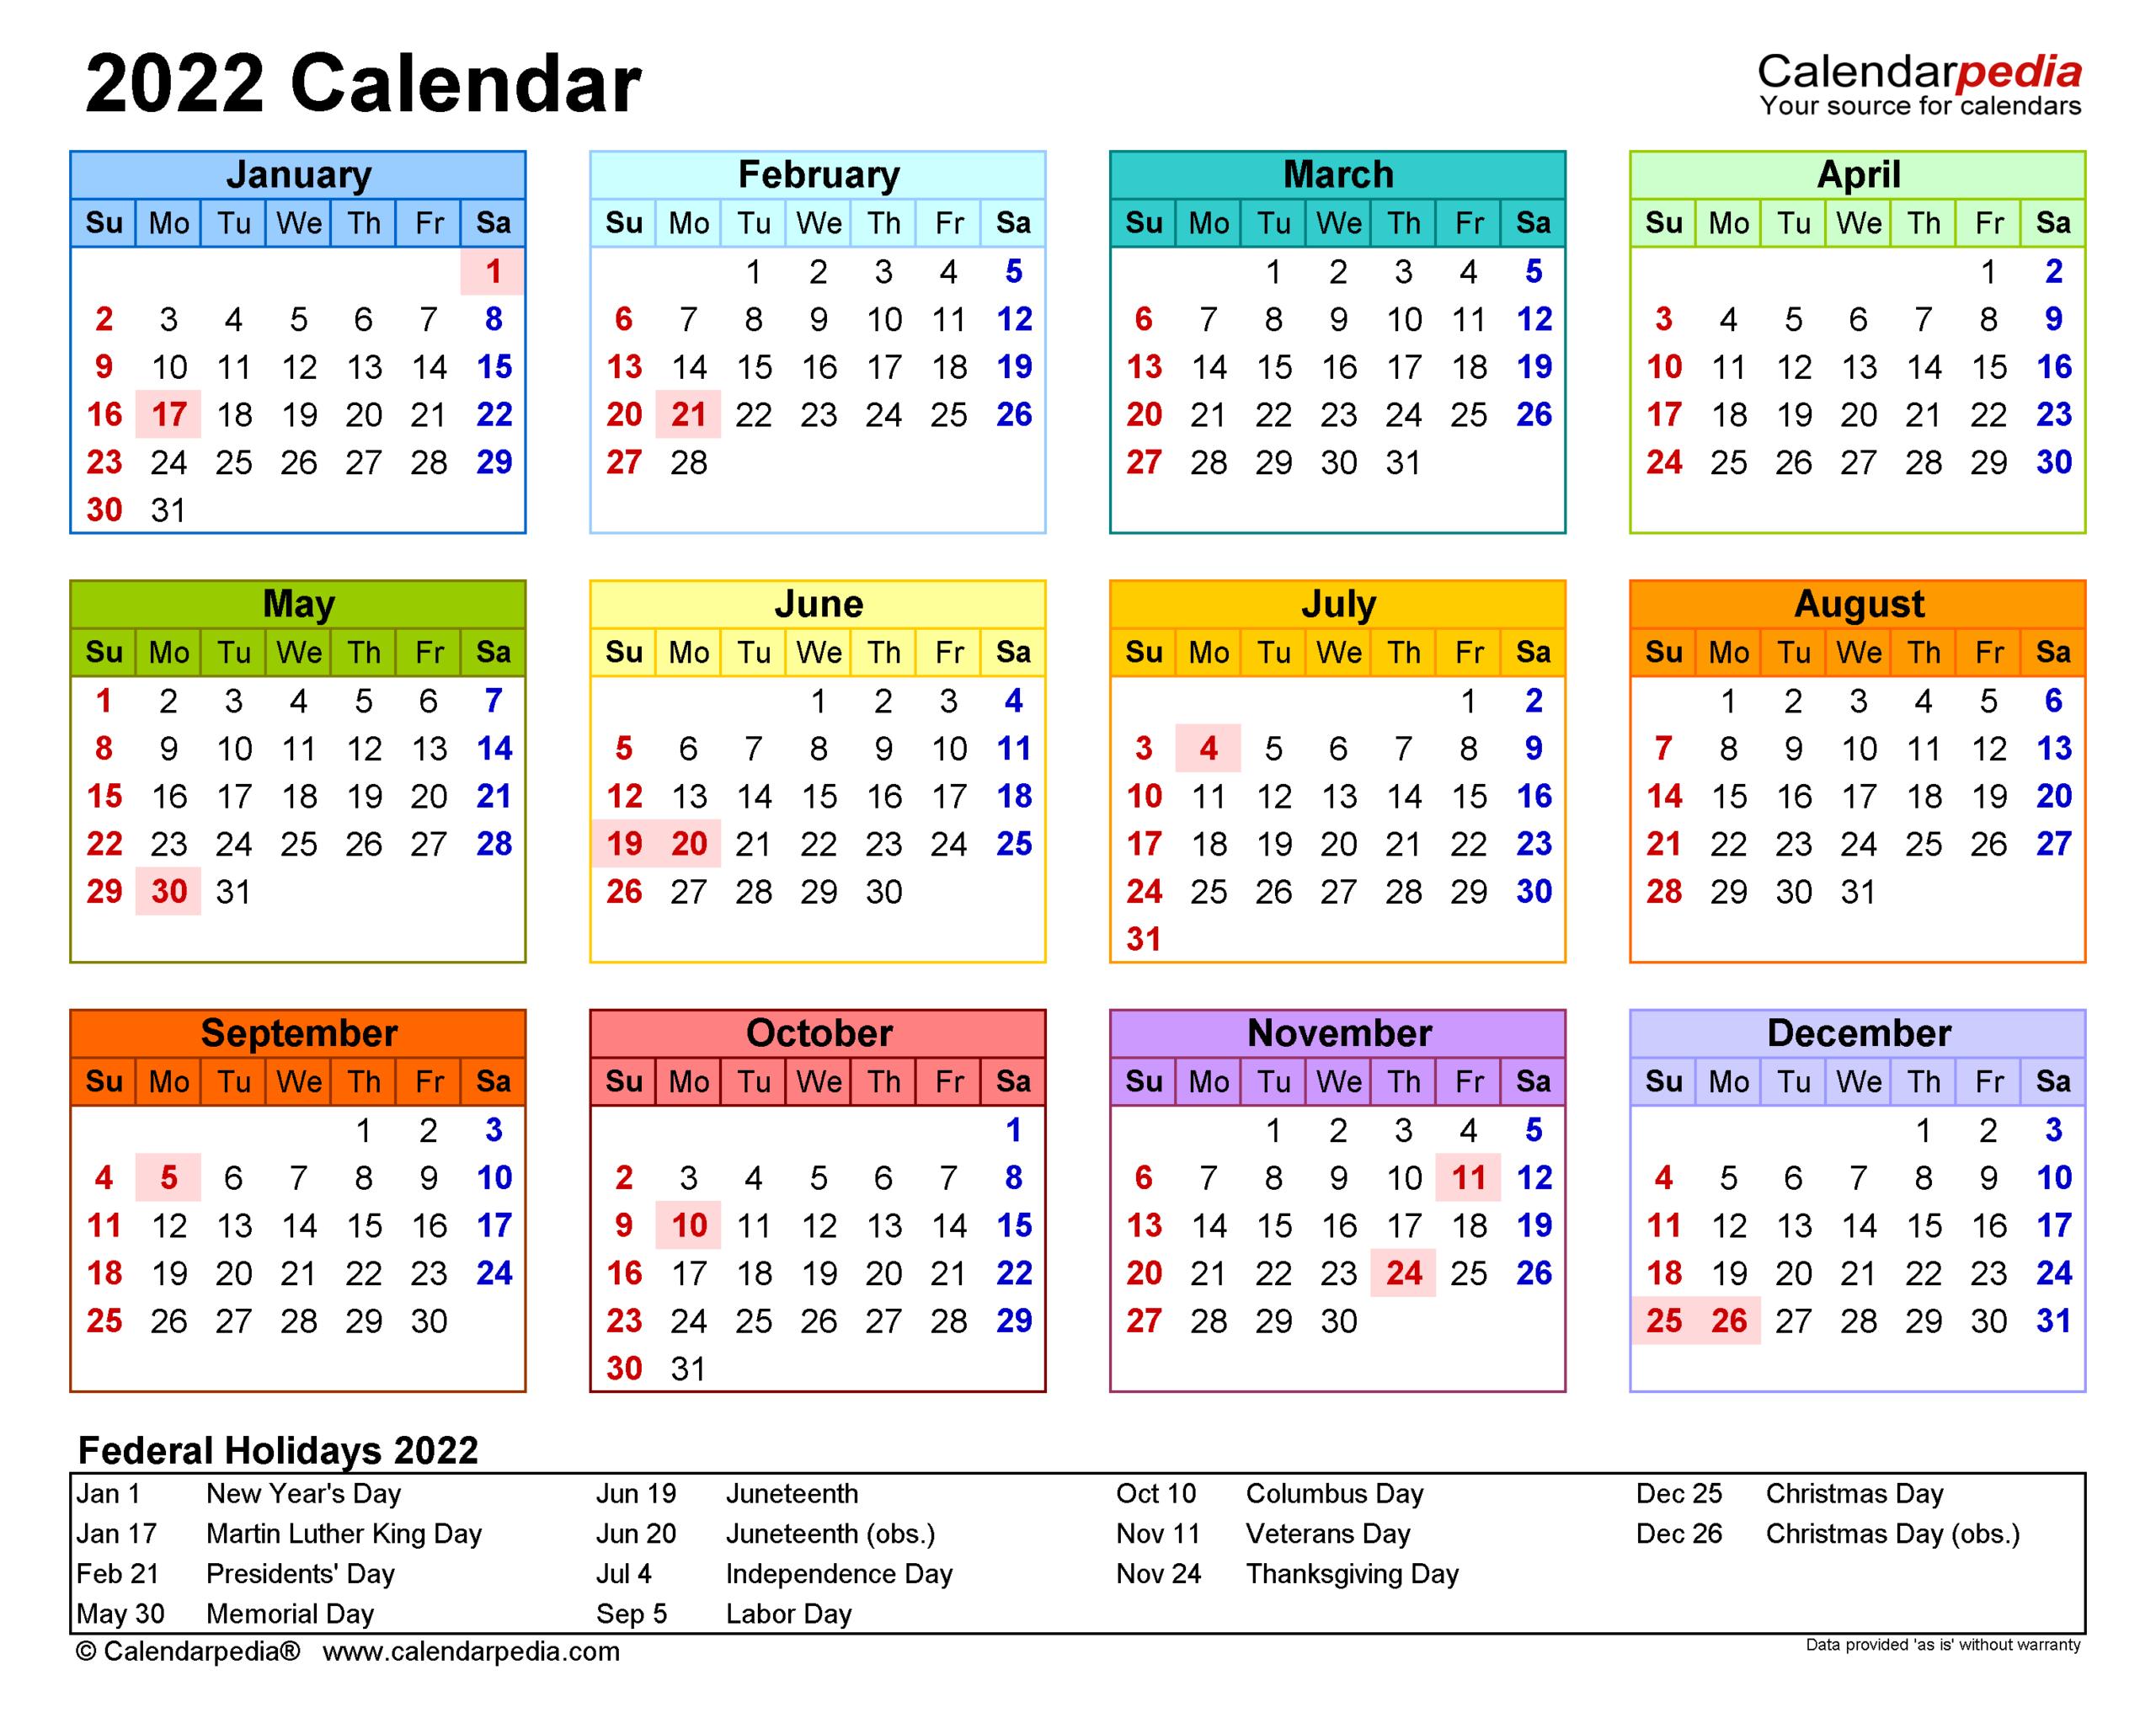 2022 Calendar - Free Printable Excel Templates - Calendarpedia regarding Free Printable Monthly Planner 2022 Photo